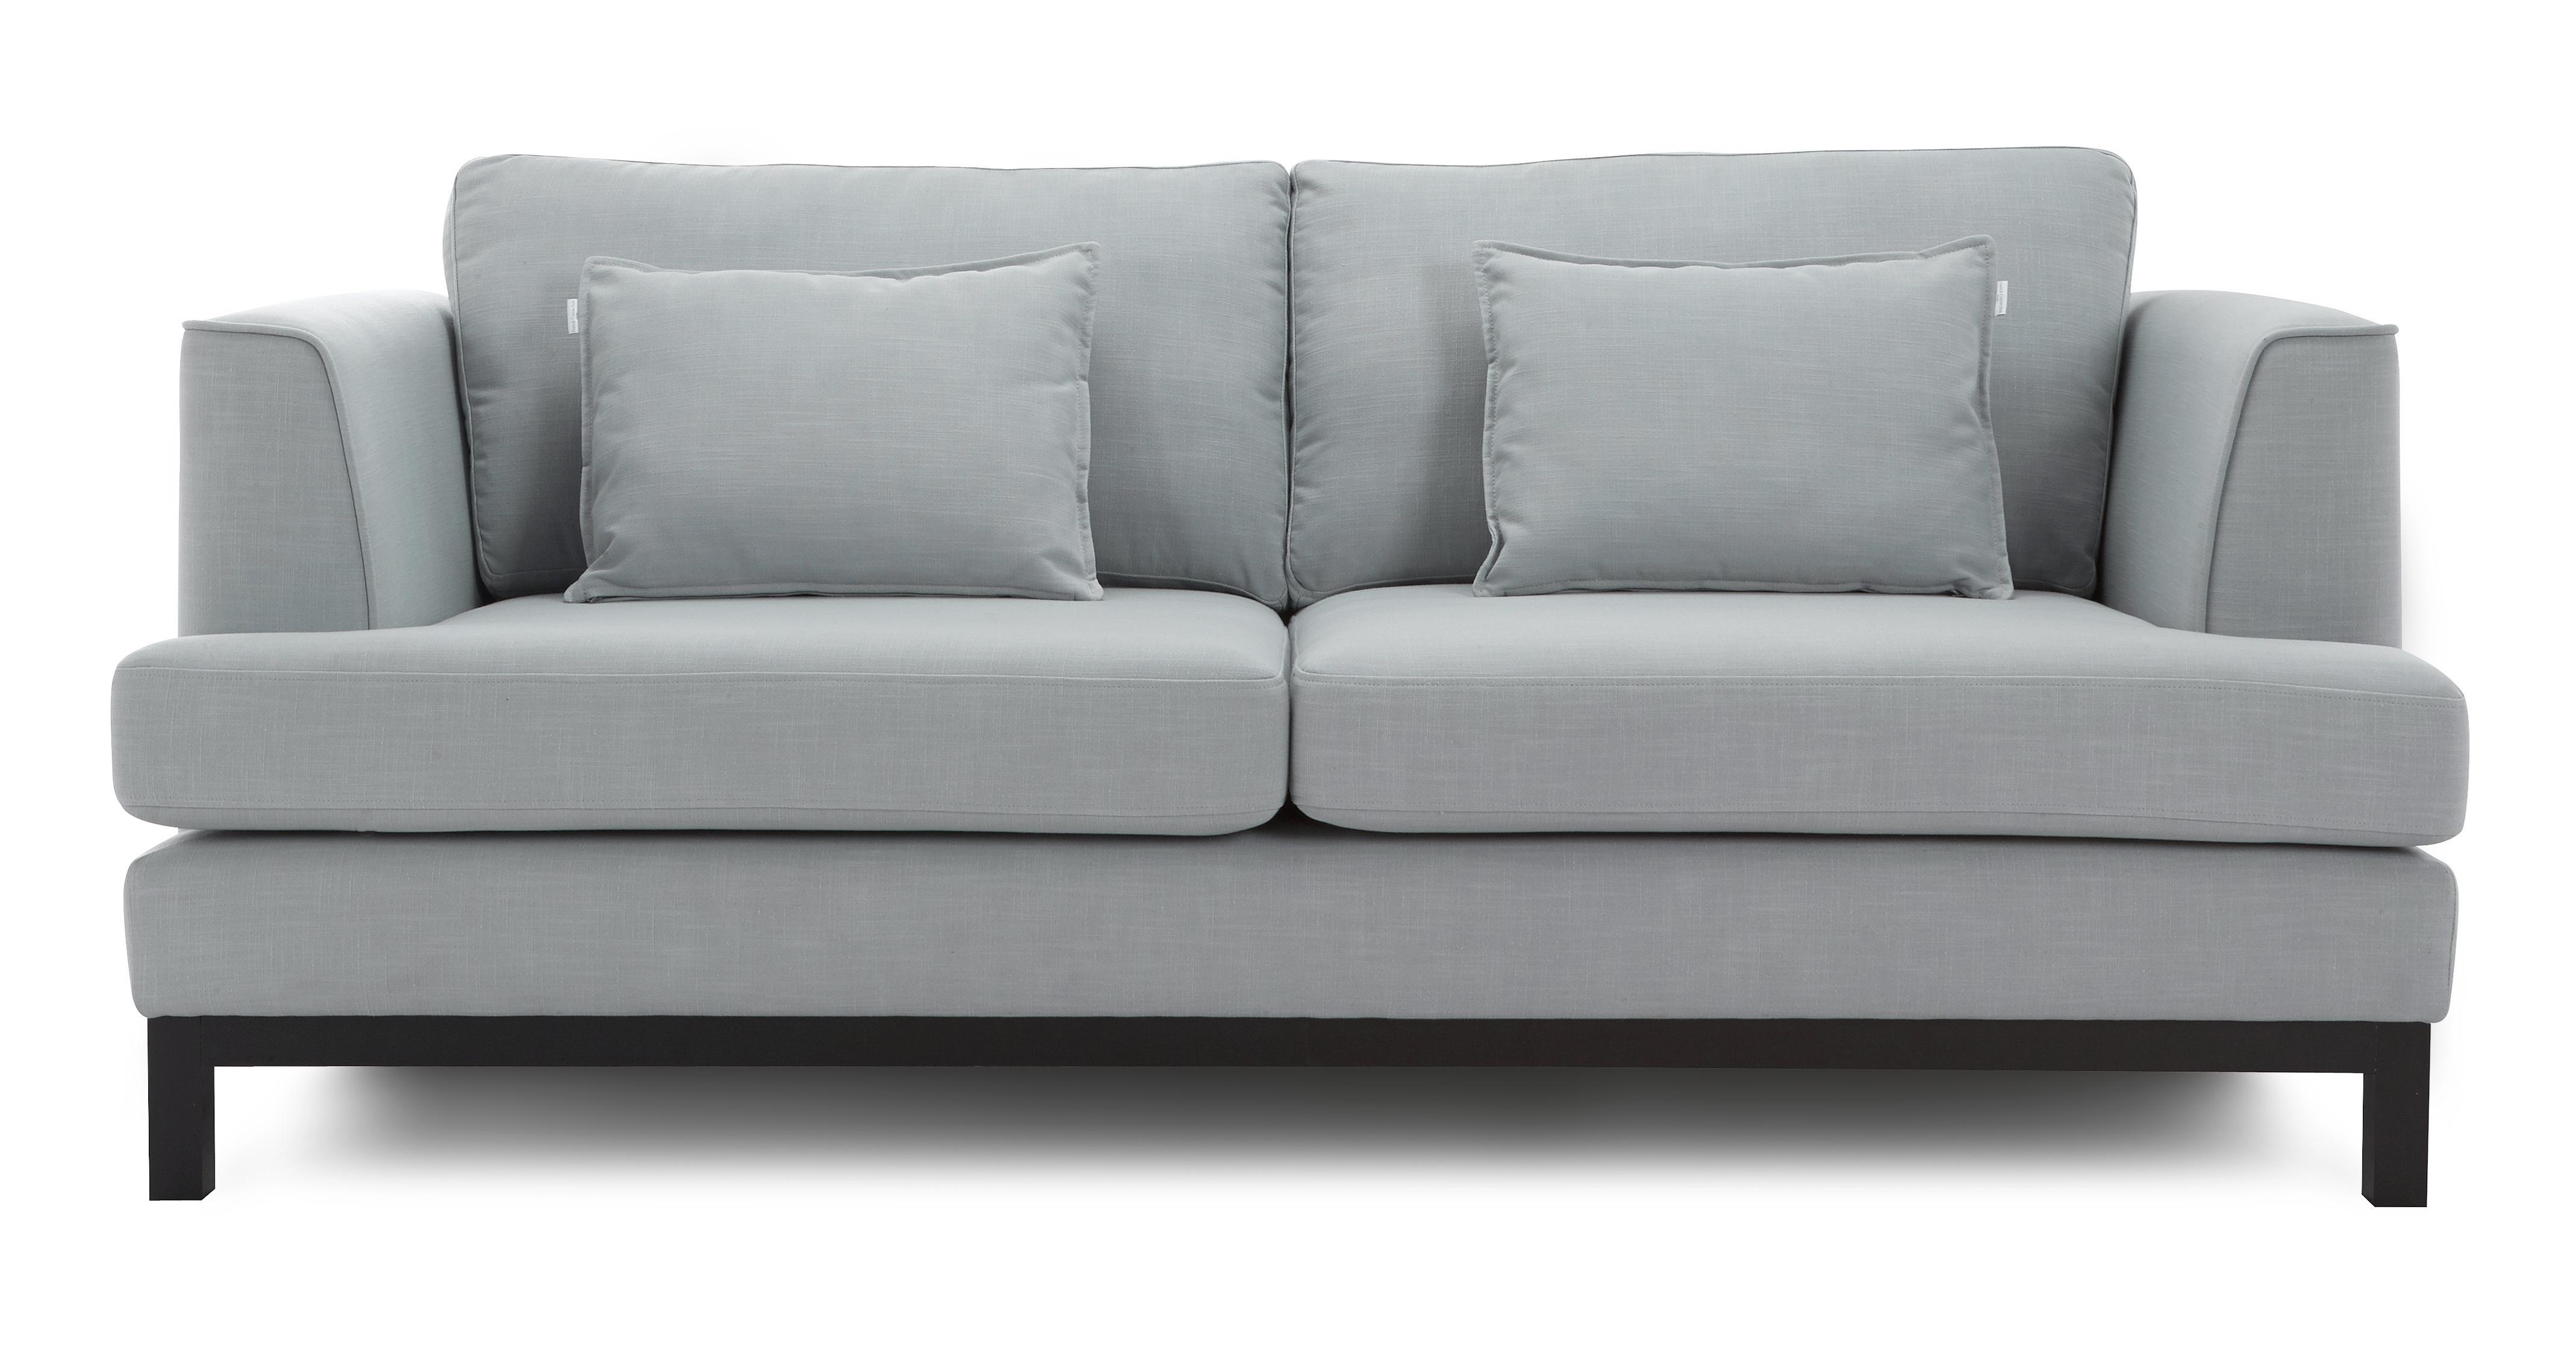 dfs french connection flint sofa. Black Bedroom Furniture Sets. Home Design Ideas